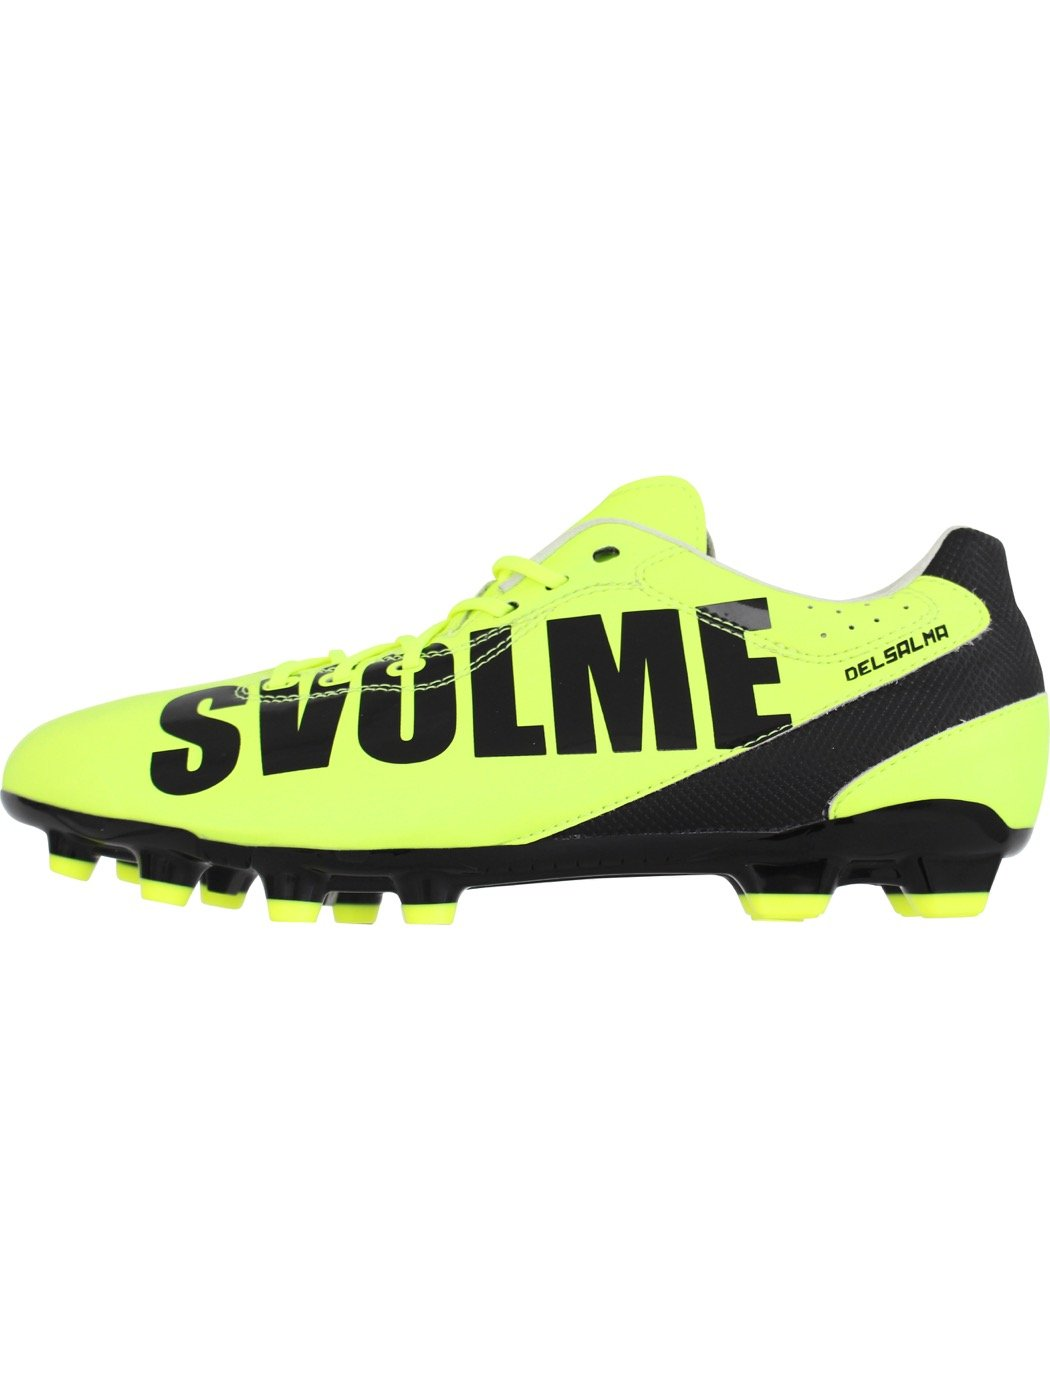 SVOLME(スボルメ) DELSALMA-4 SL 171-32660 B06XVS8JY2 23.0 cm|ライム ライム 23.0 cm